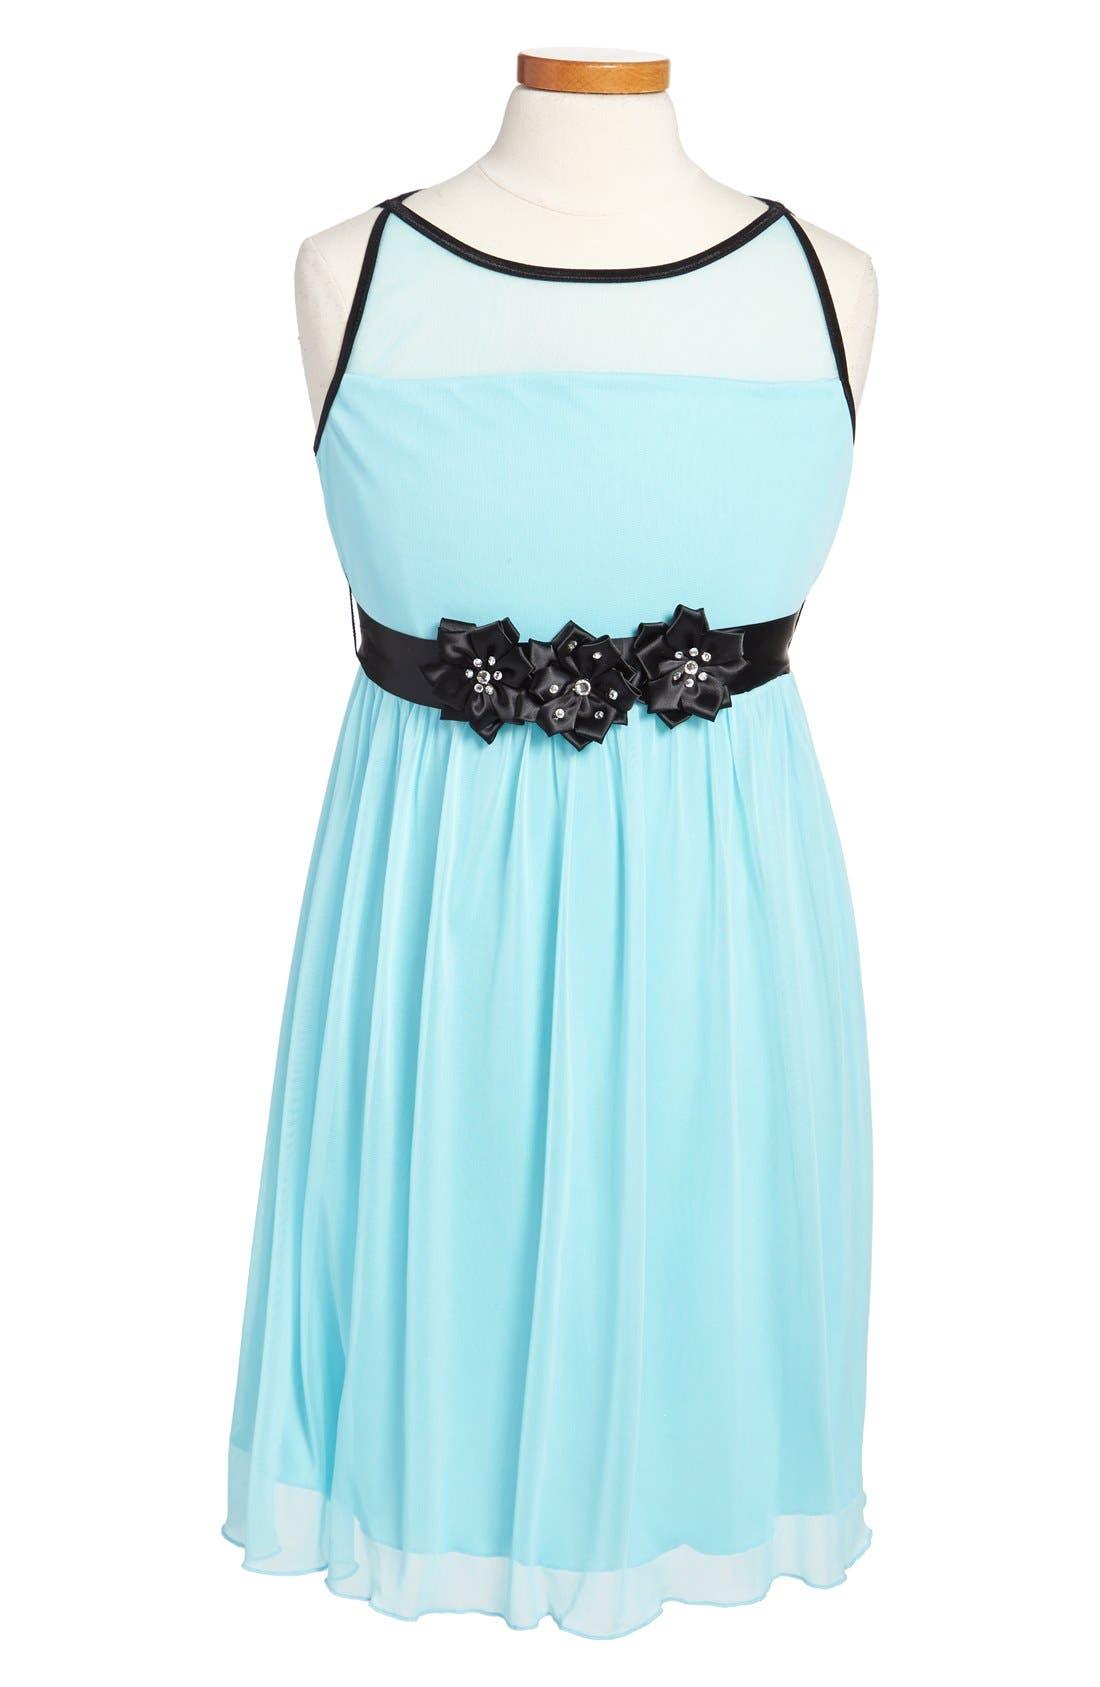 Alternate Image 1 Selected - Roxette Sleeveless Illusion Bodice Dress (Big Girls)